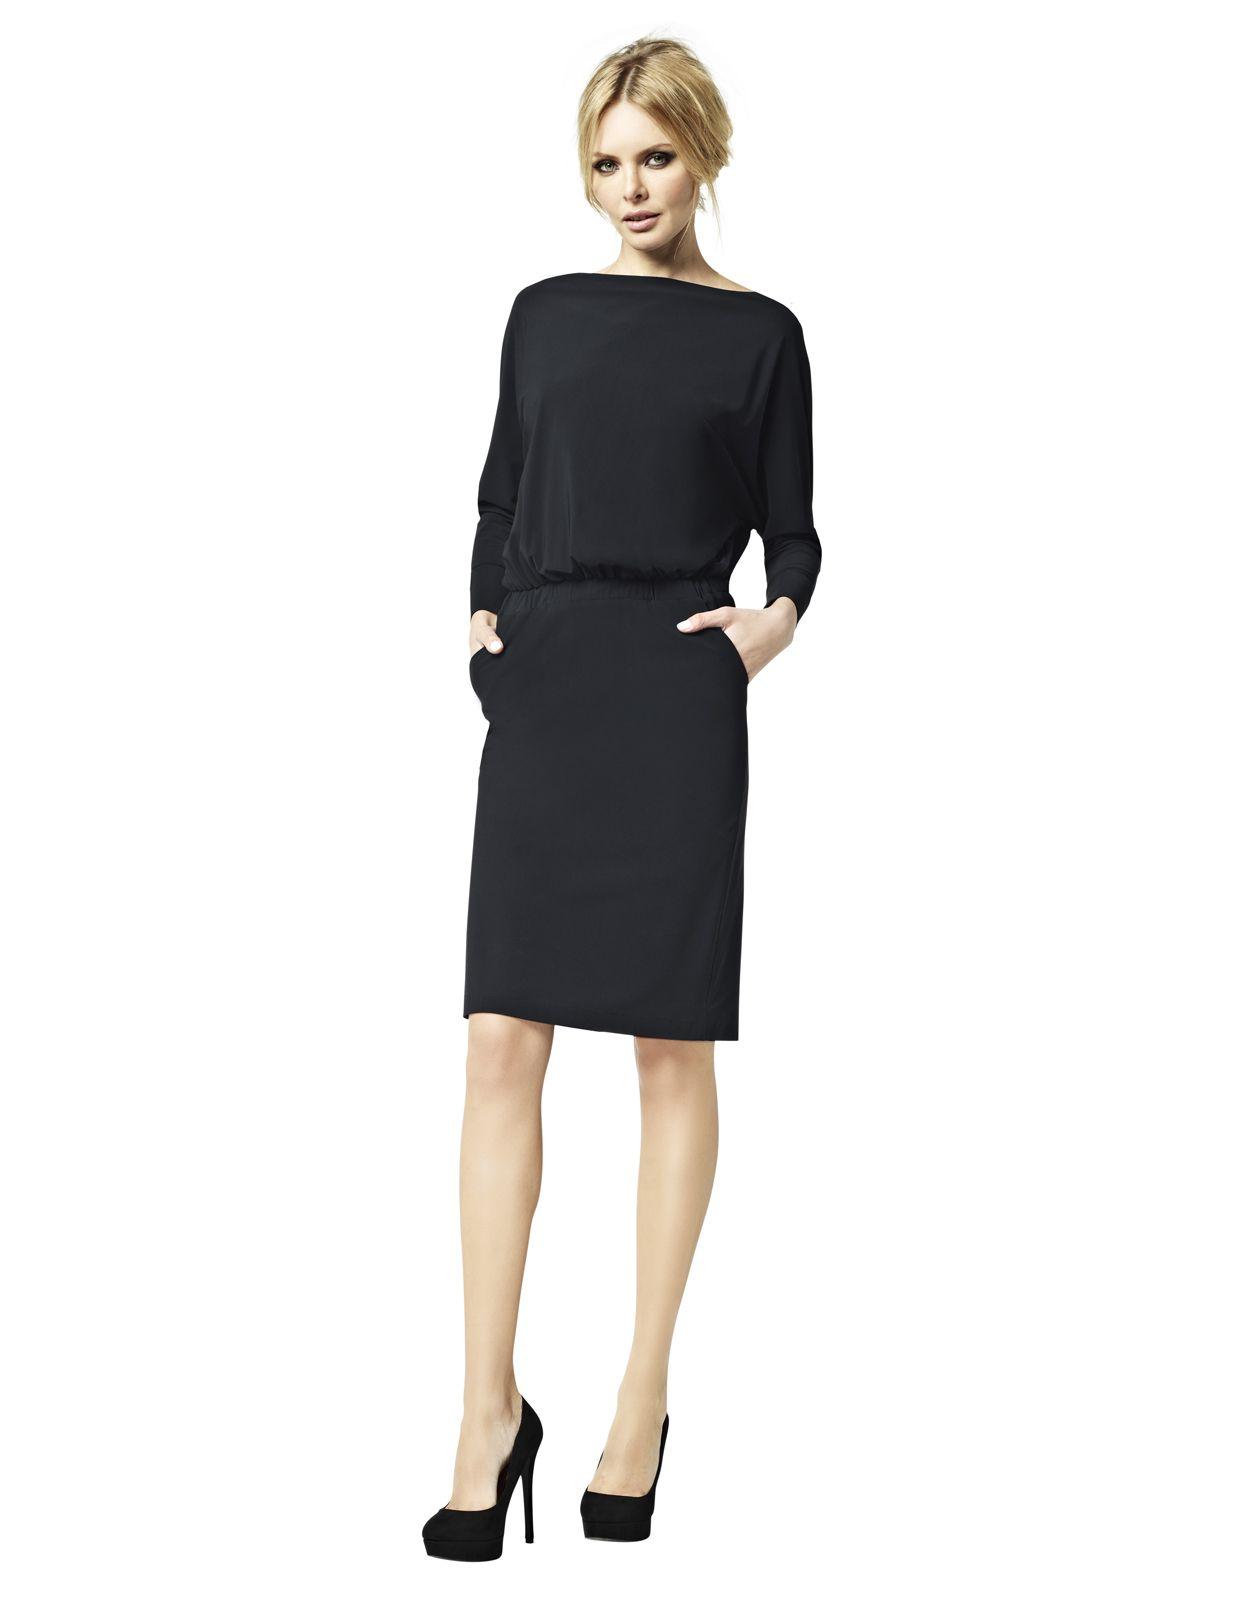 LBD van La dress